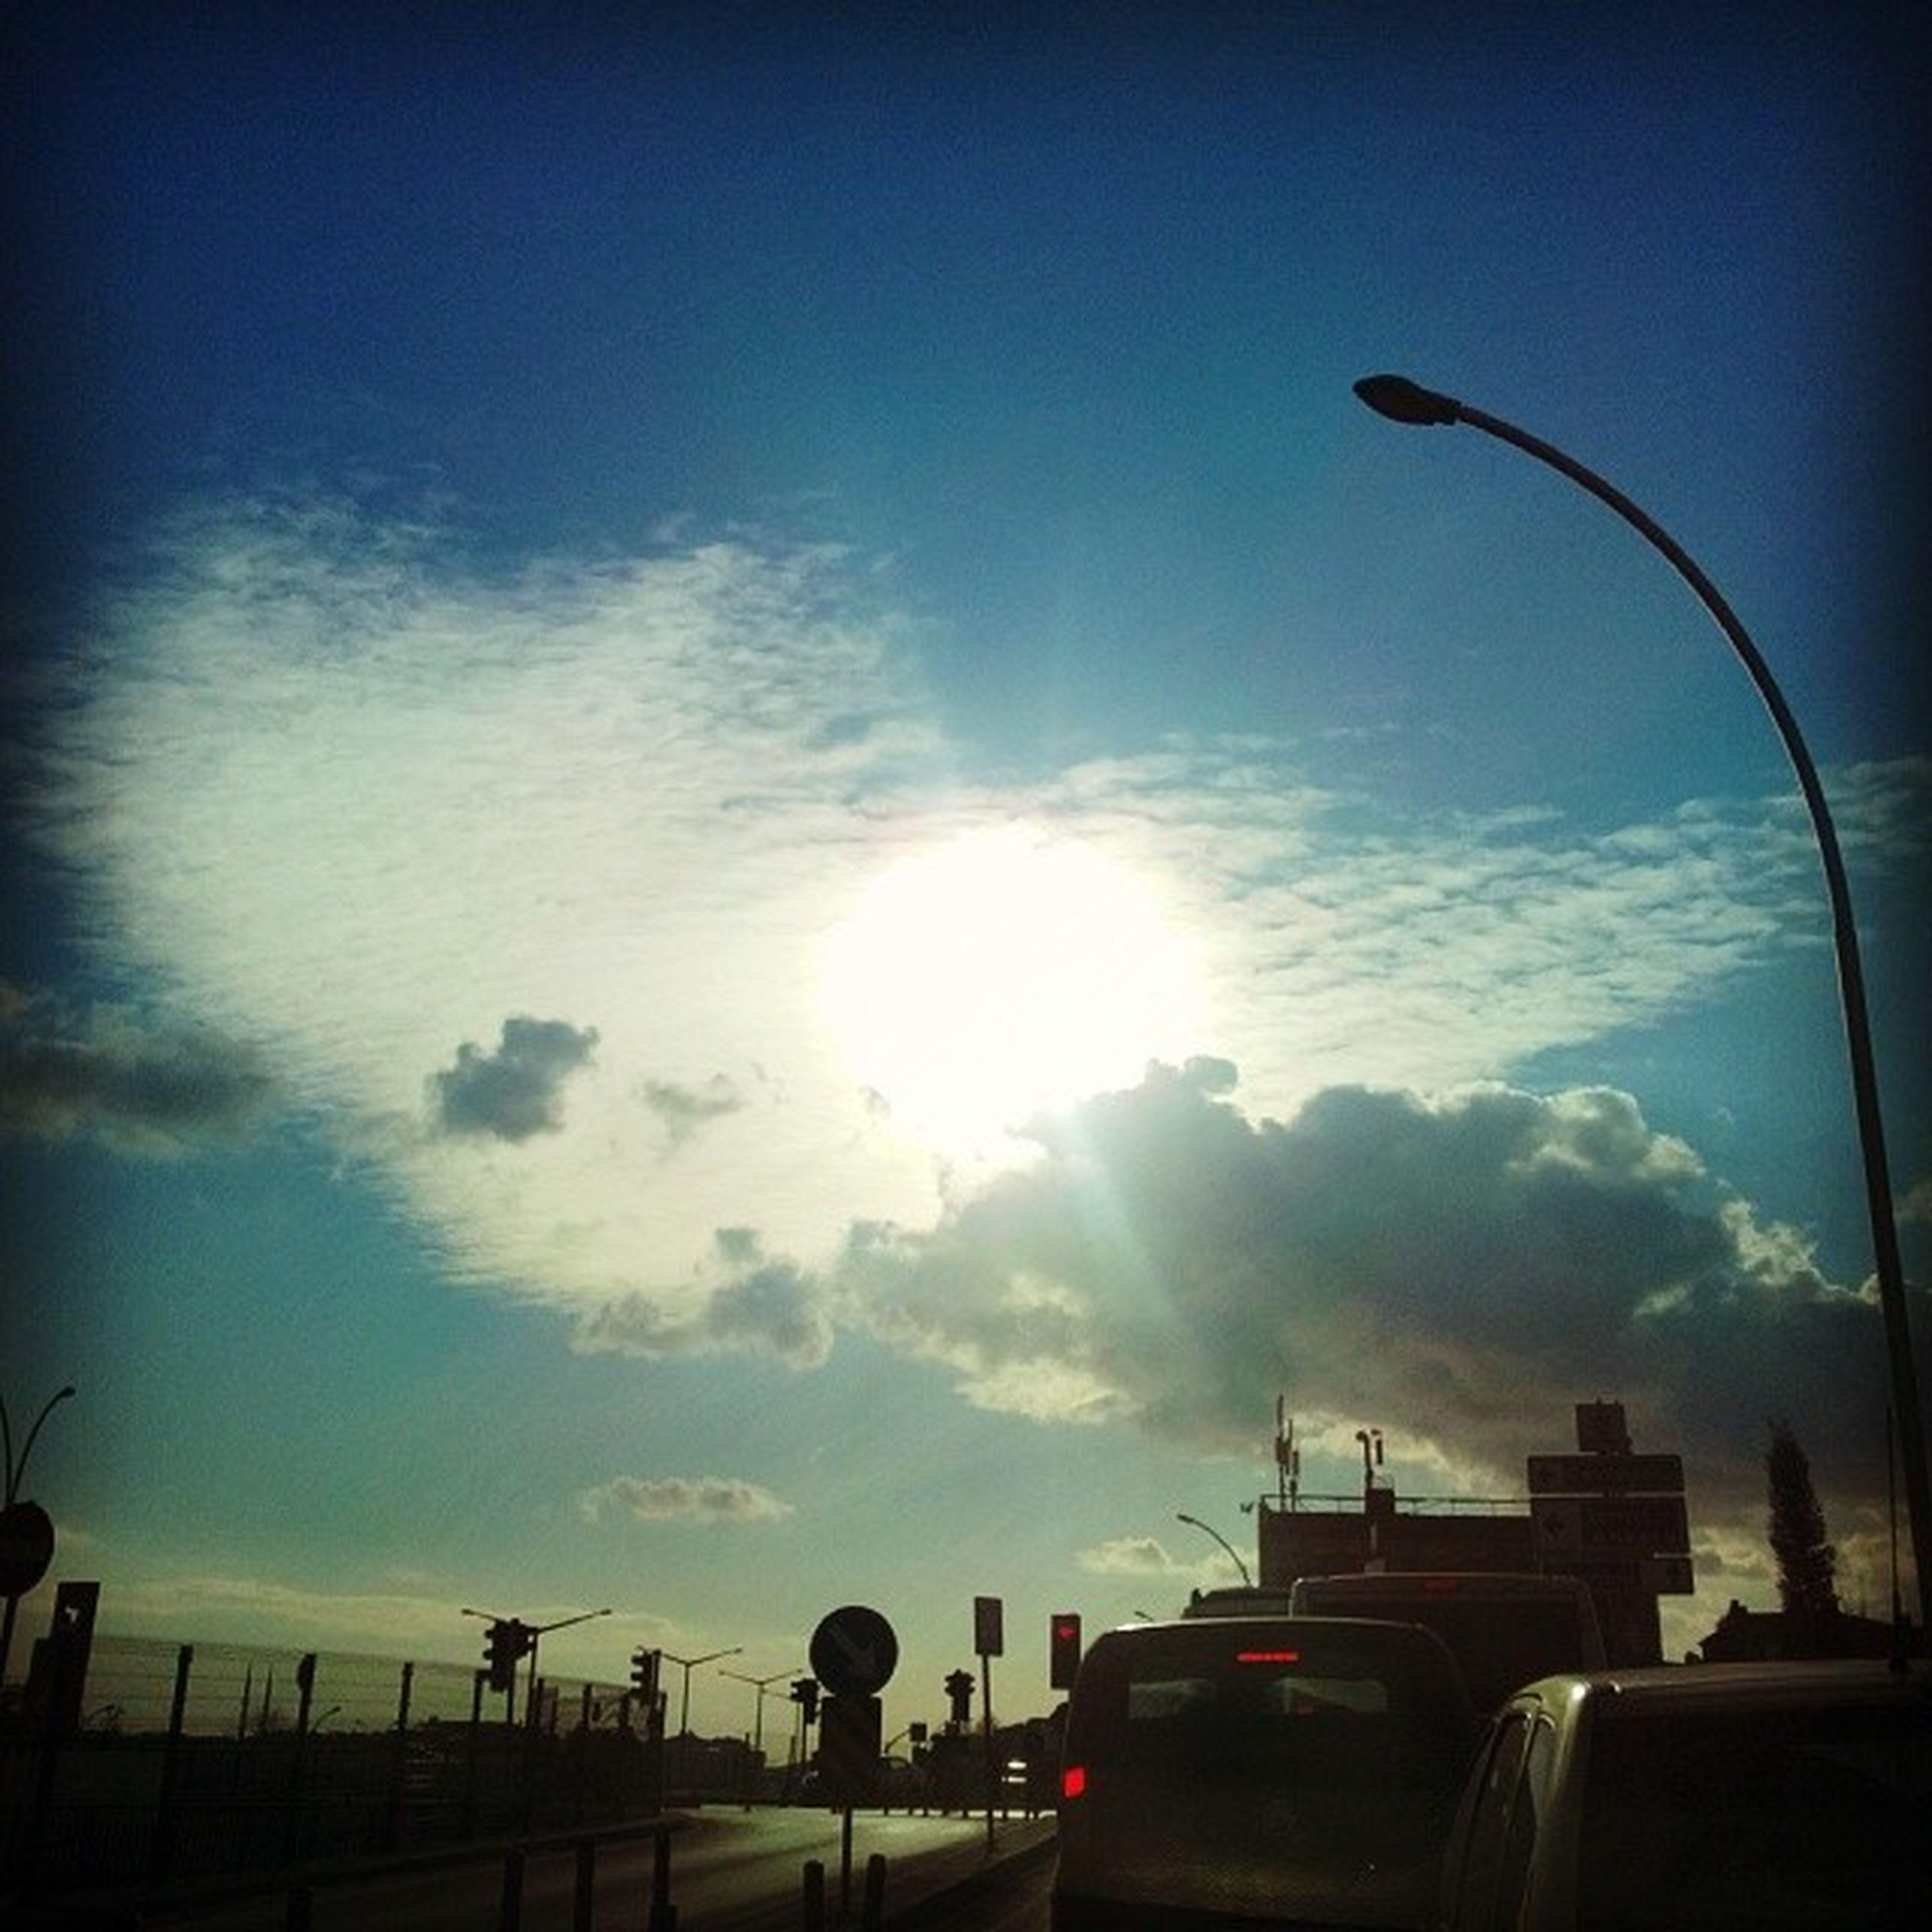 sky, transportation, sun, car, silhouette, cloud - sky, mode of transport, land vehicle, sunset, sunbeam, sunlight, lens flare, street light, low angle view, road, cloud, nature, street, outdoors, beauty in nature